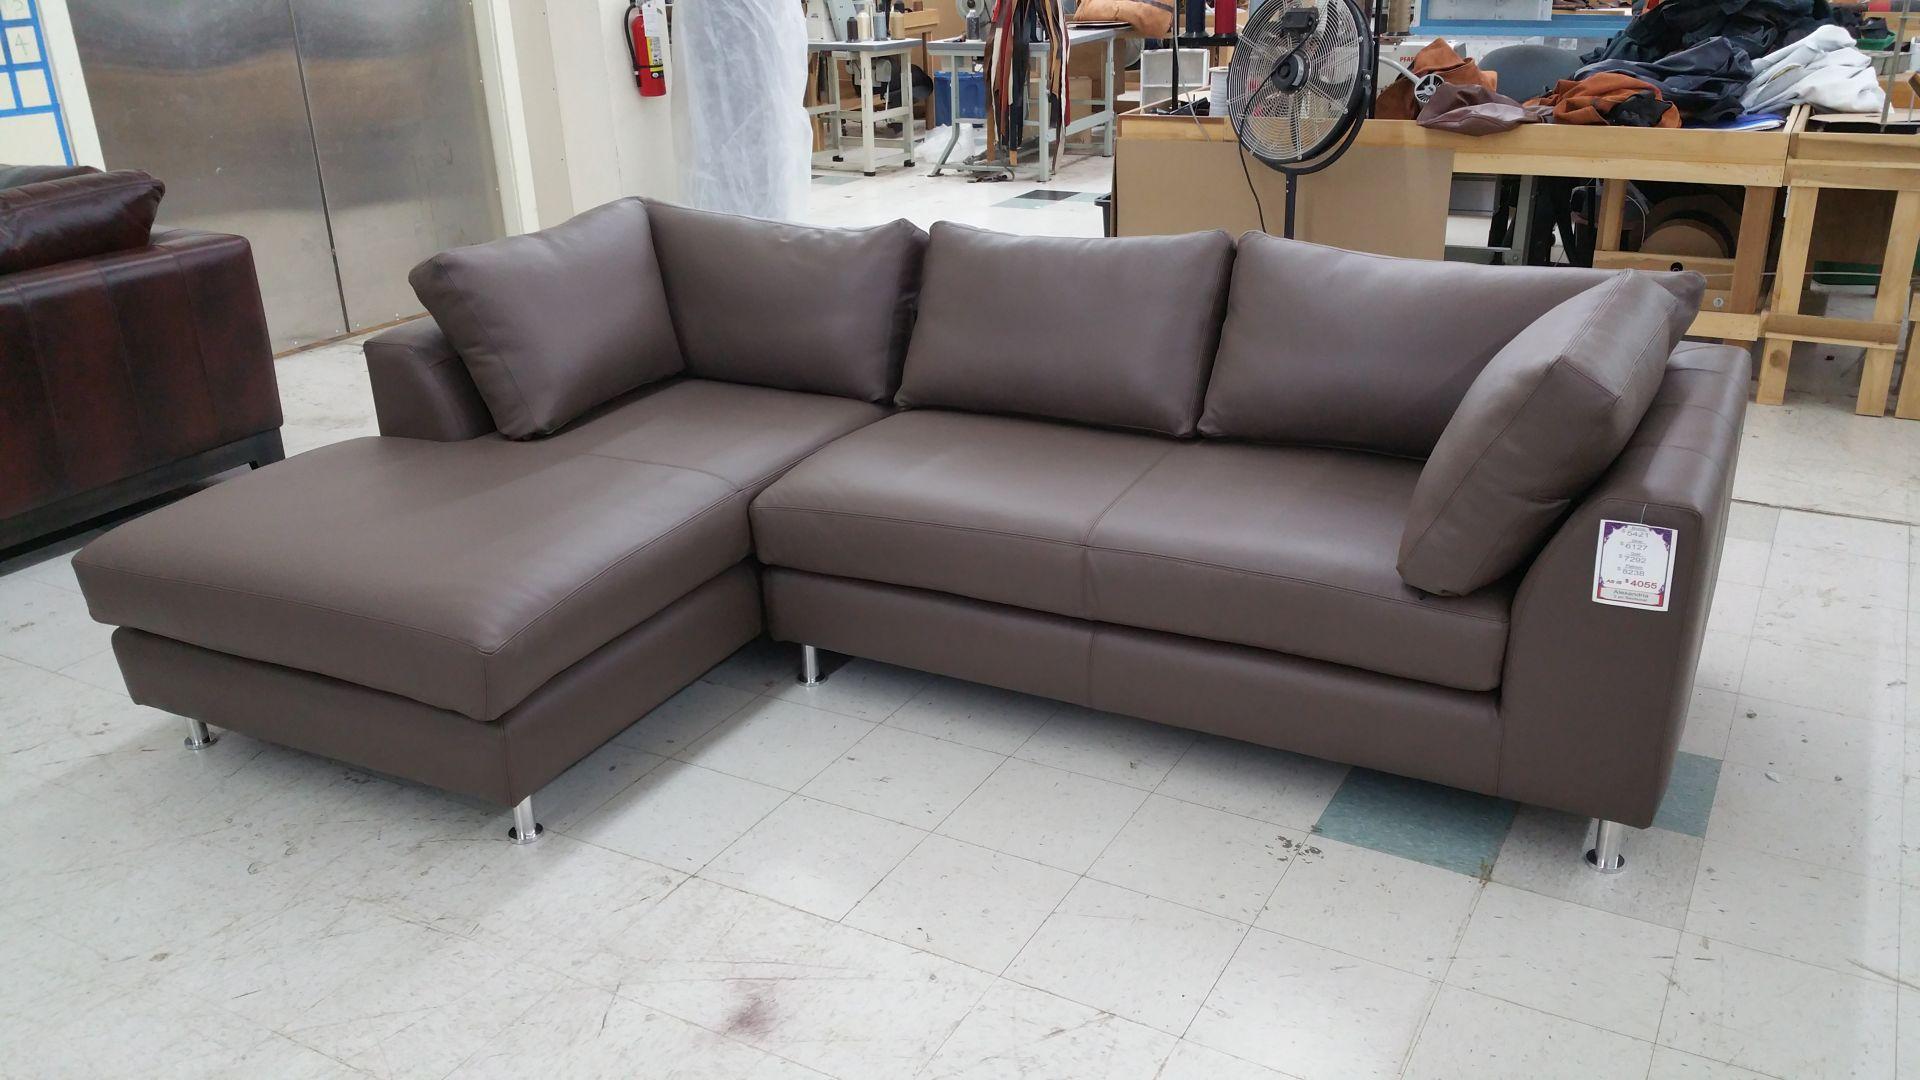 Outlet Sofa Adrian Sofa Graphite Value City Furniture